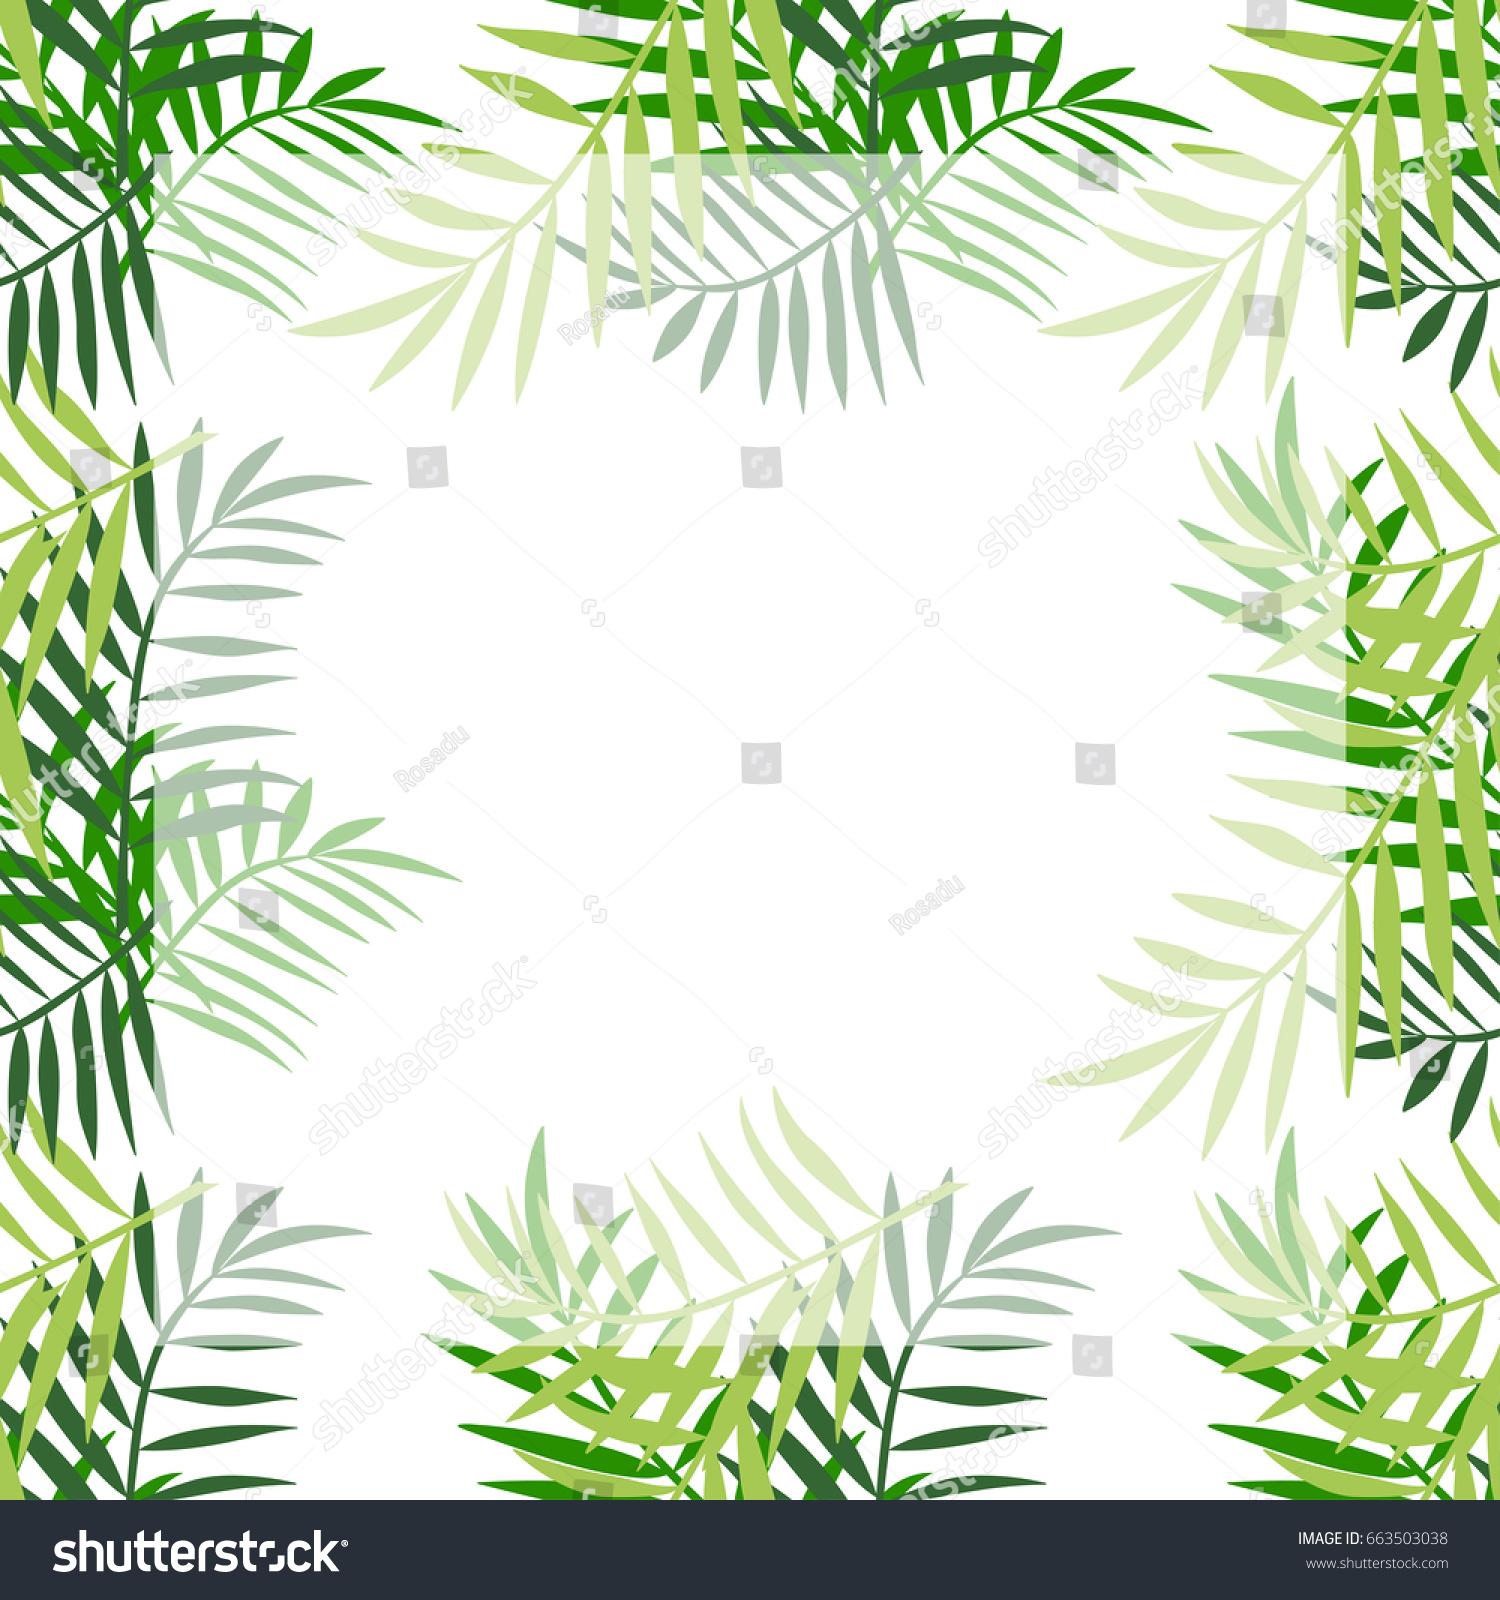 Palm Tree Leaves Frame Border Tropical Stock Vector Royalty Free 663503038 Tropical black leaves on dark background vector. https www shutterstock com image vector palm tree leaves frame border tropical 663503038